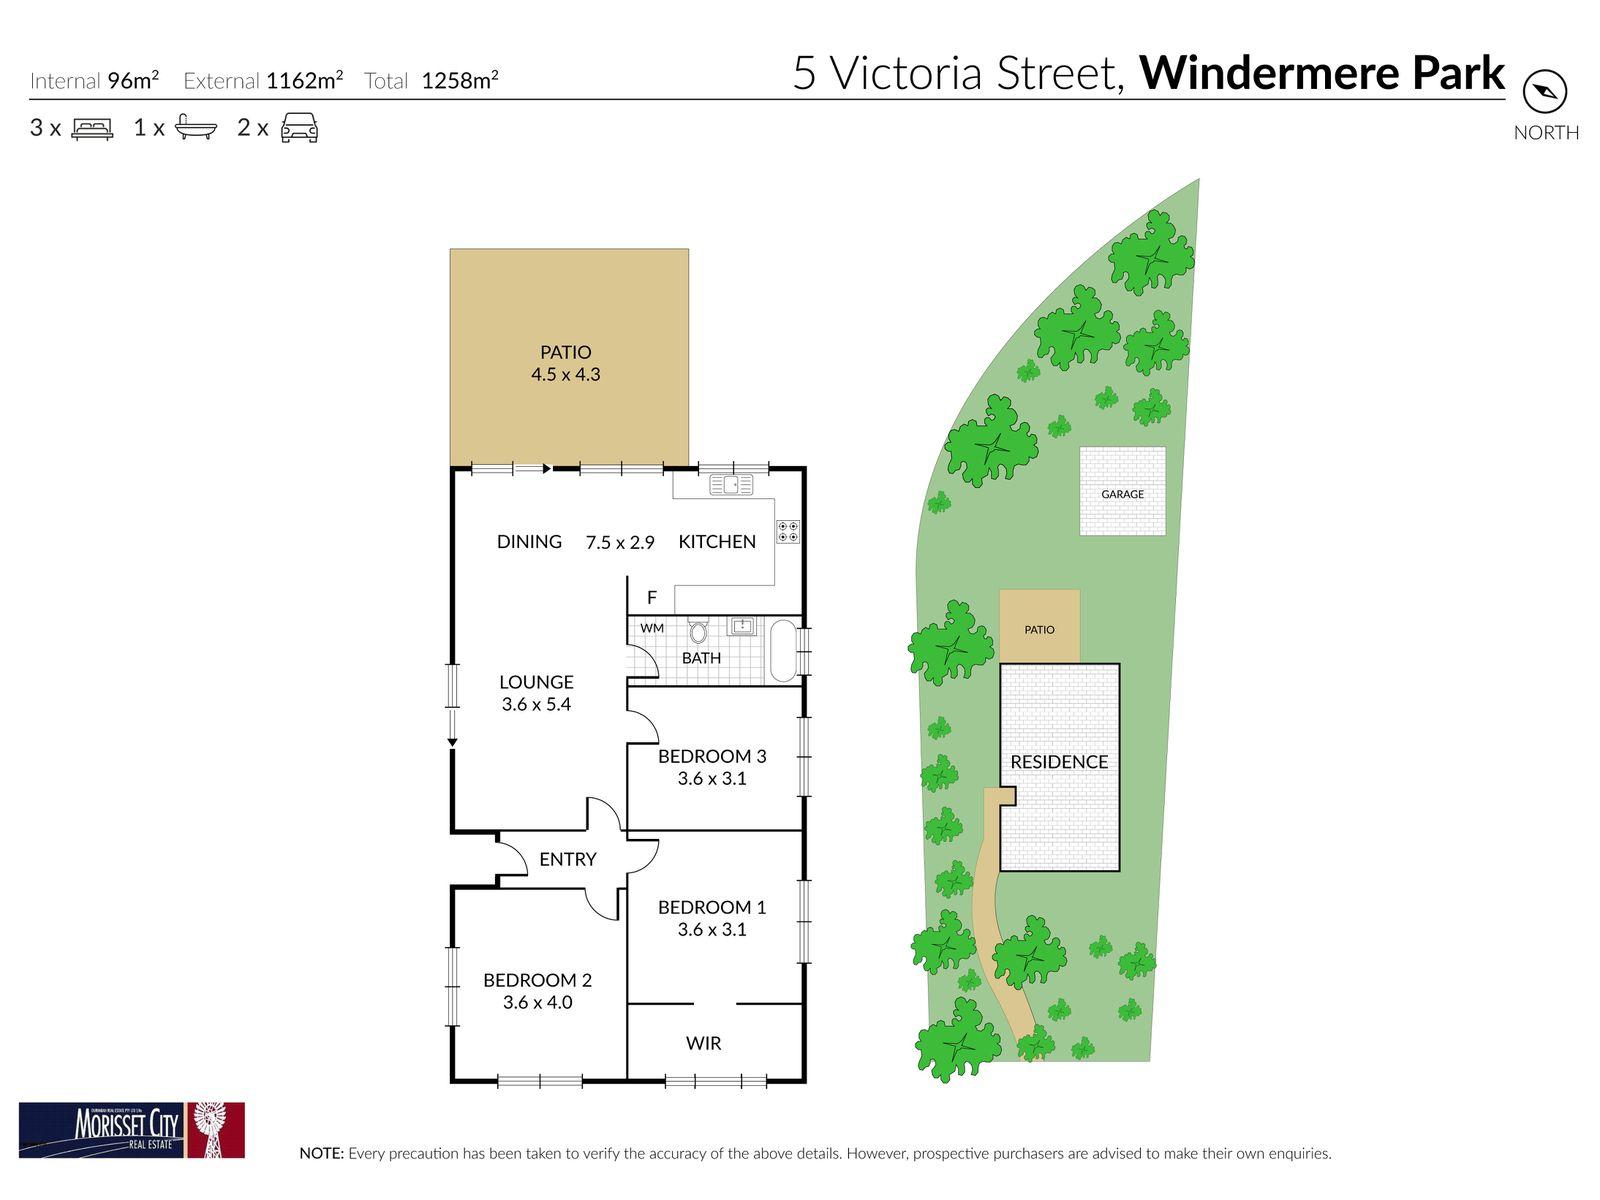 5 Victoria St, Windermere Park